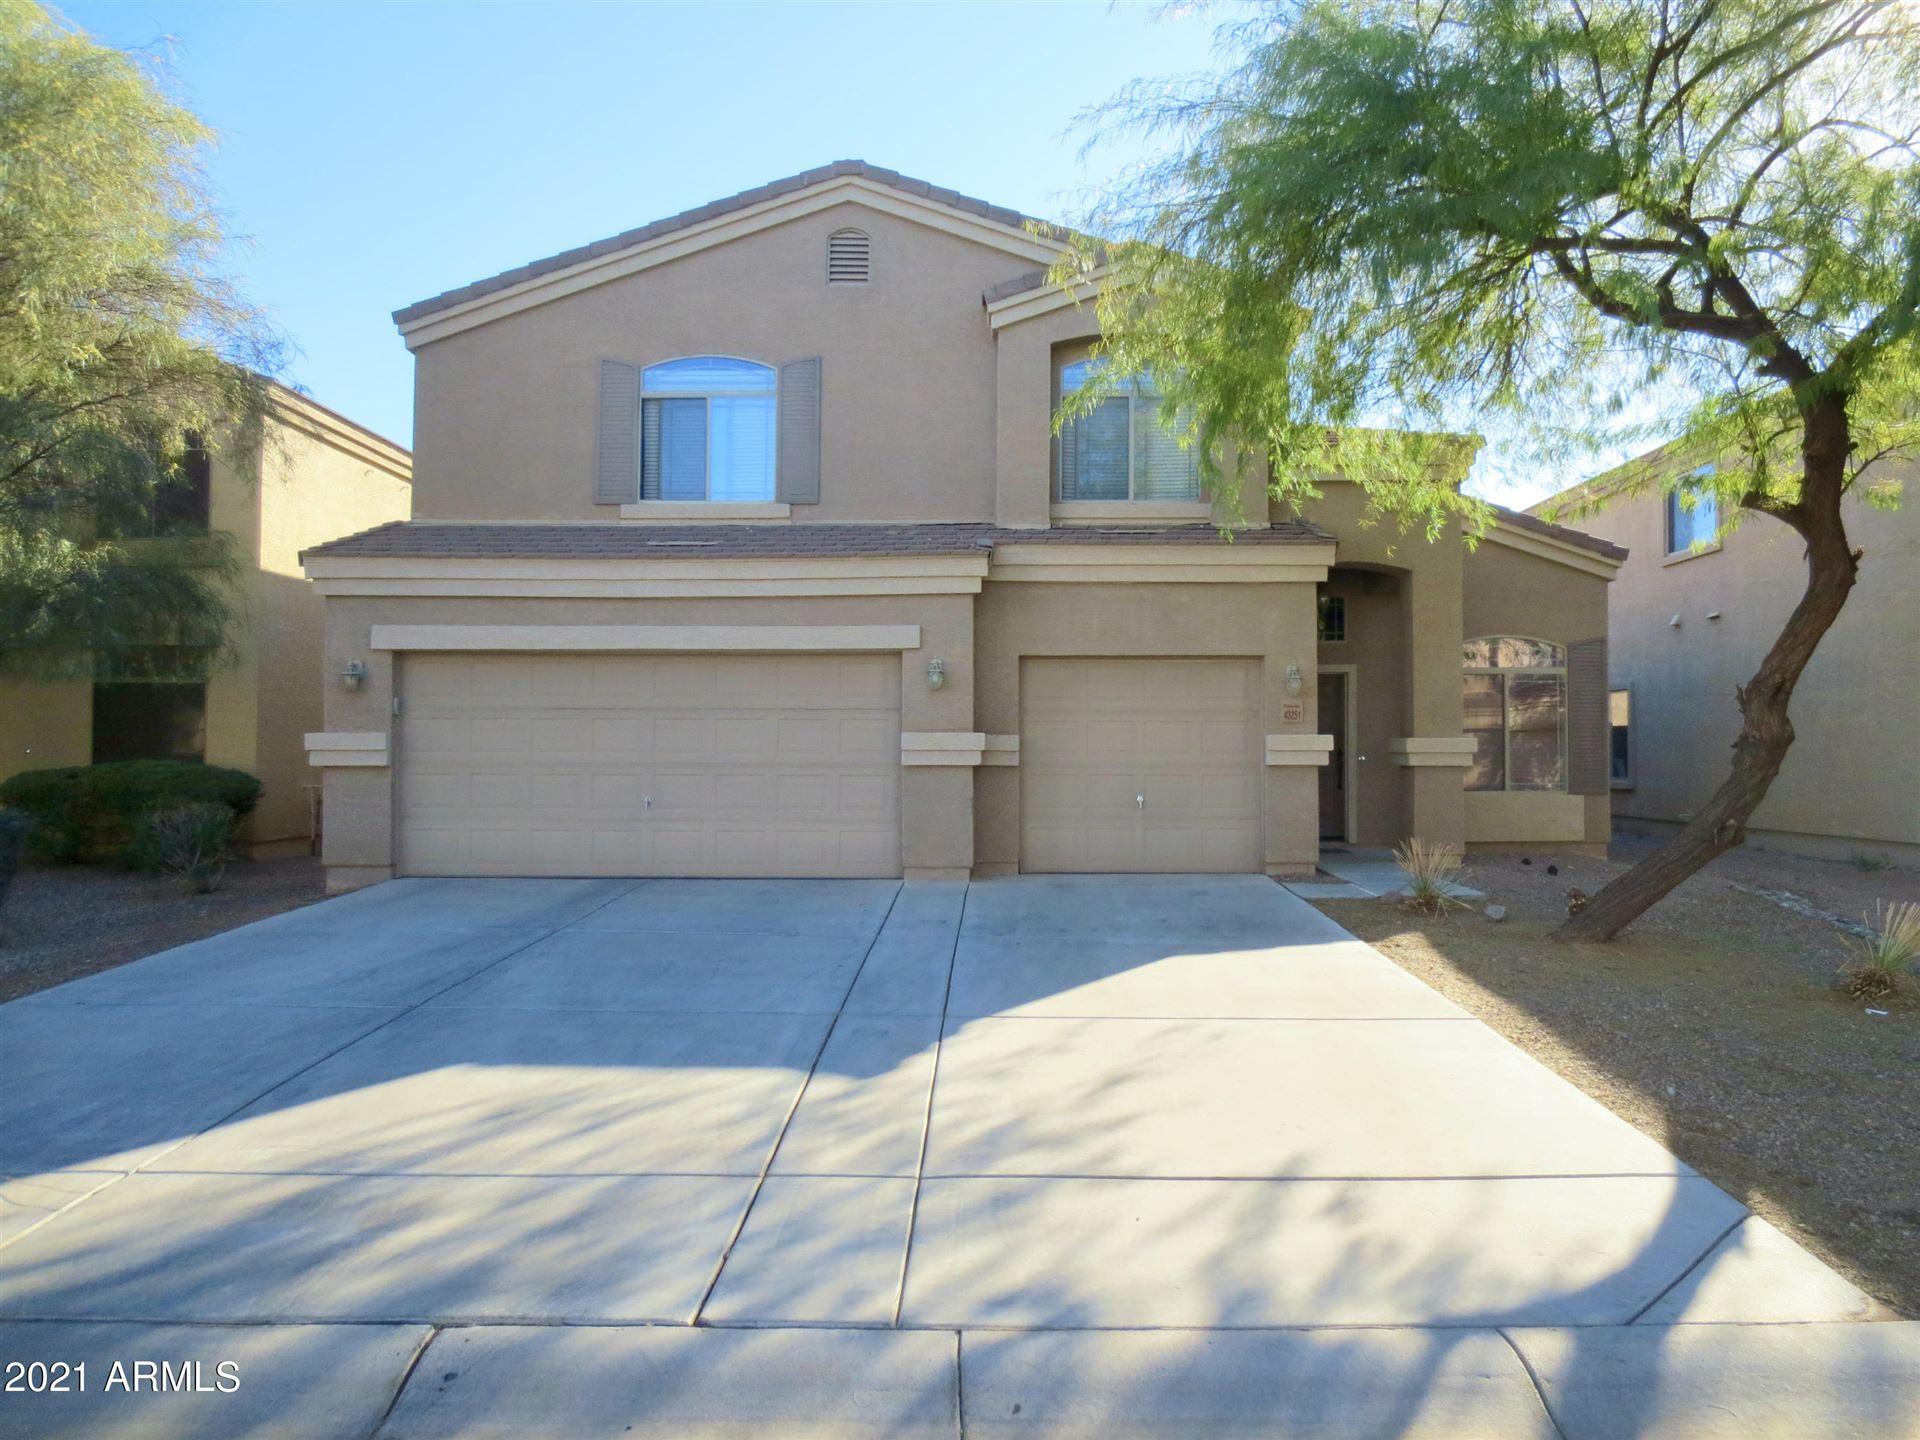 Photo for 43251 W WILD HORSE Trail, Maricopa, AZ 85138 (MLS # 6180769)